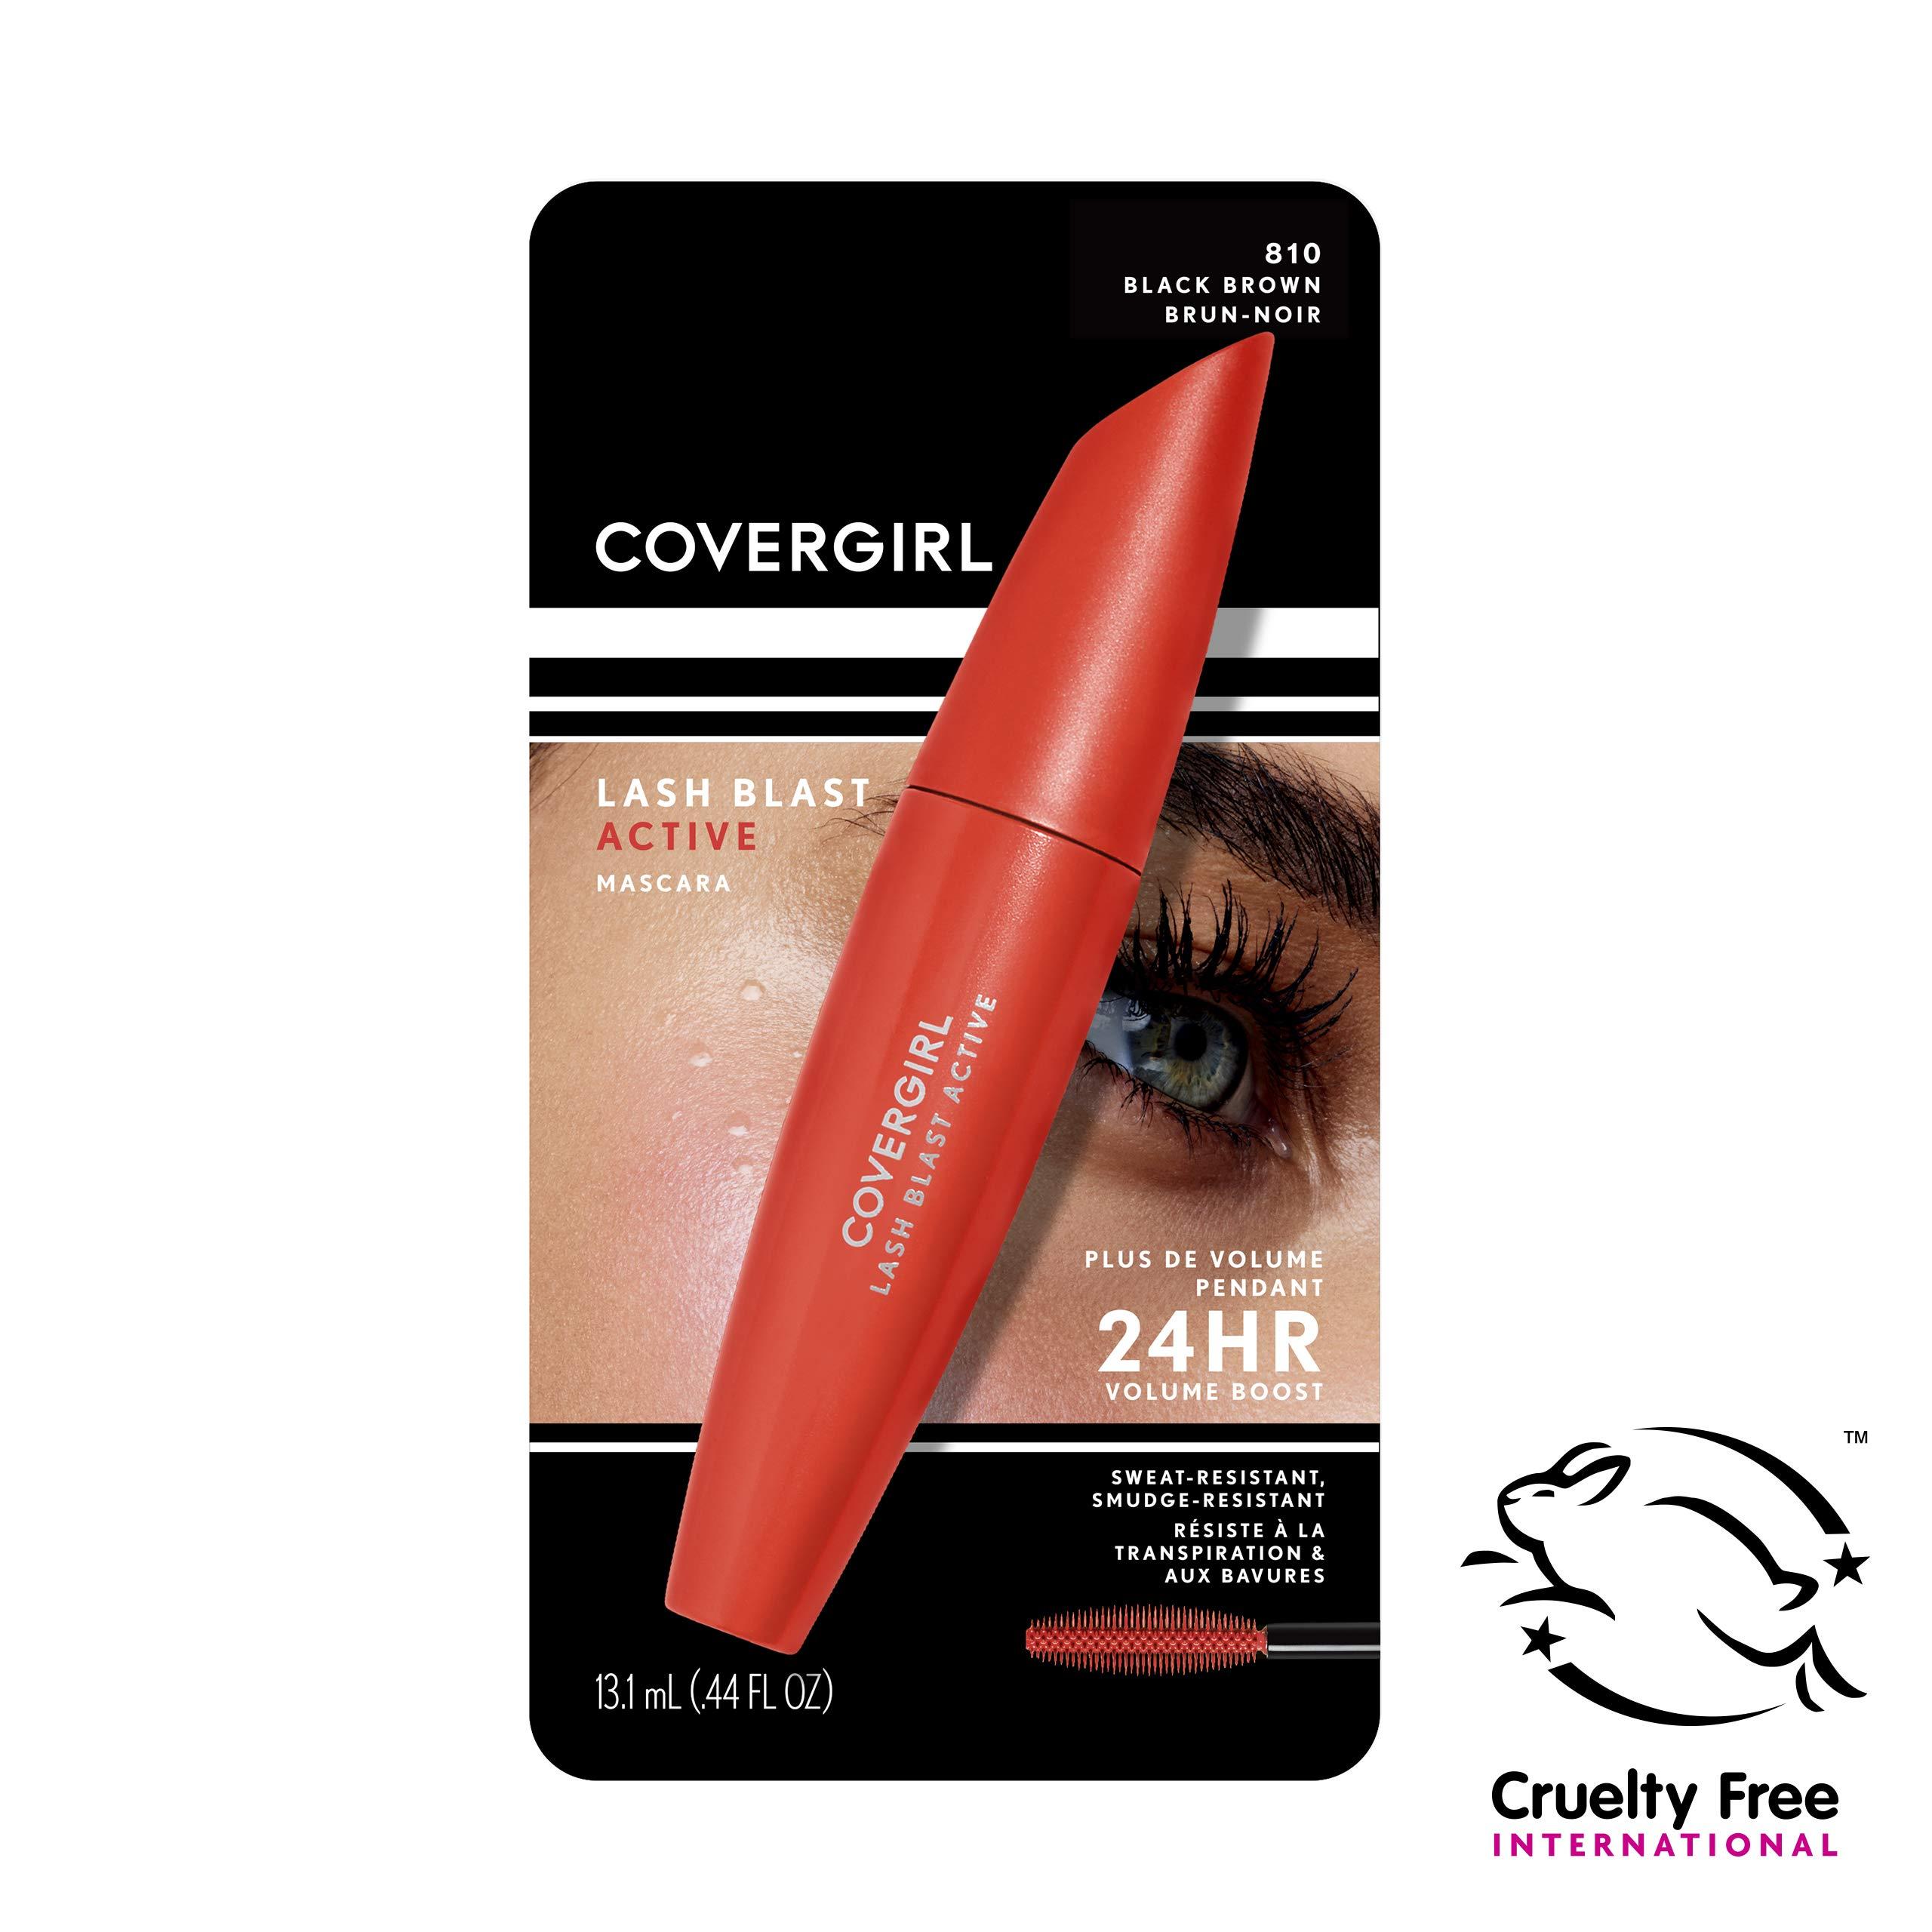 COVERGIRL - Covergirl Lash Blast Active Mascara, Black-brown